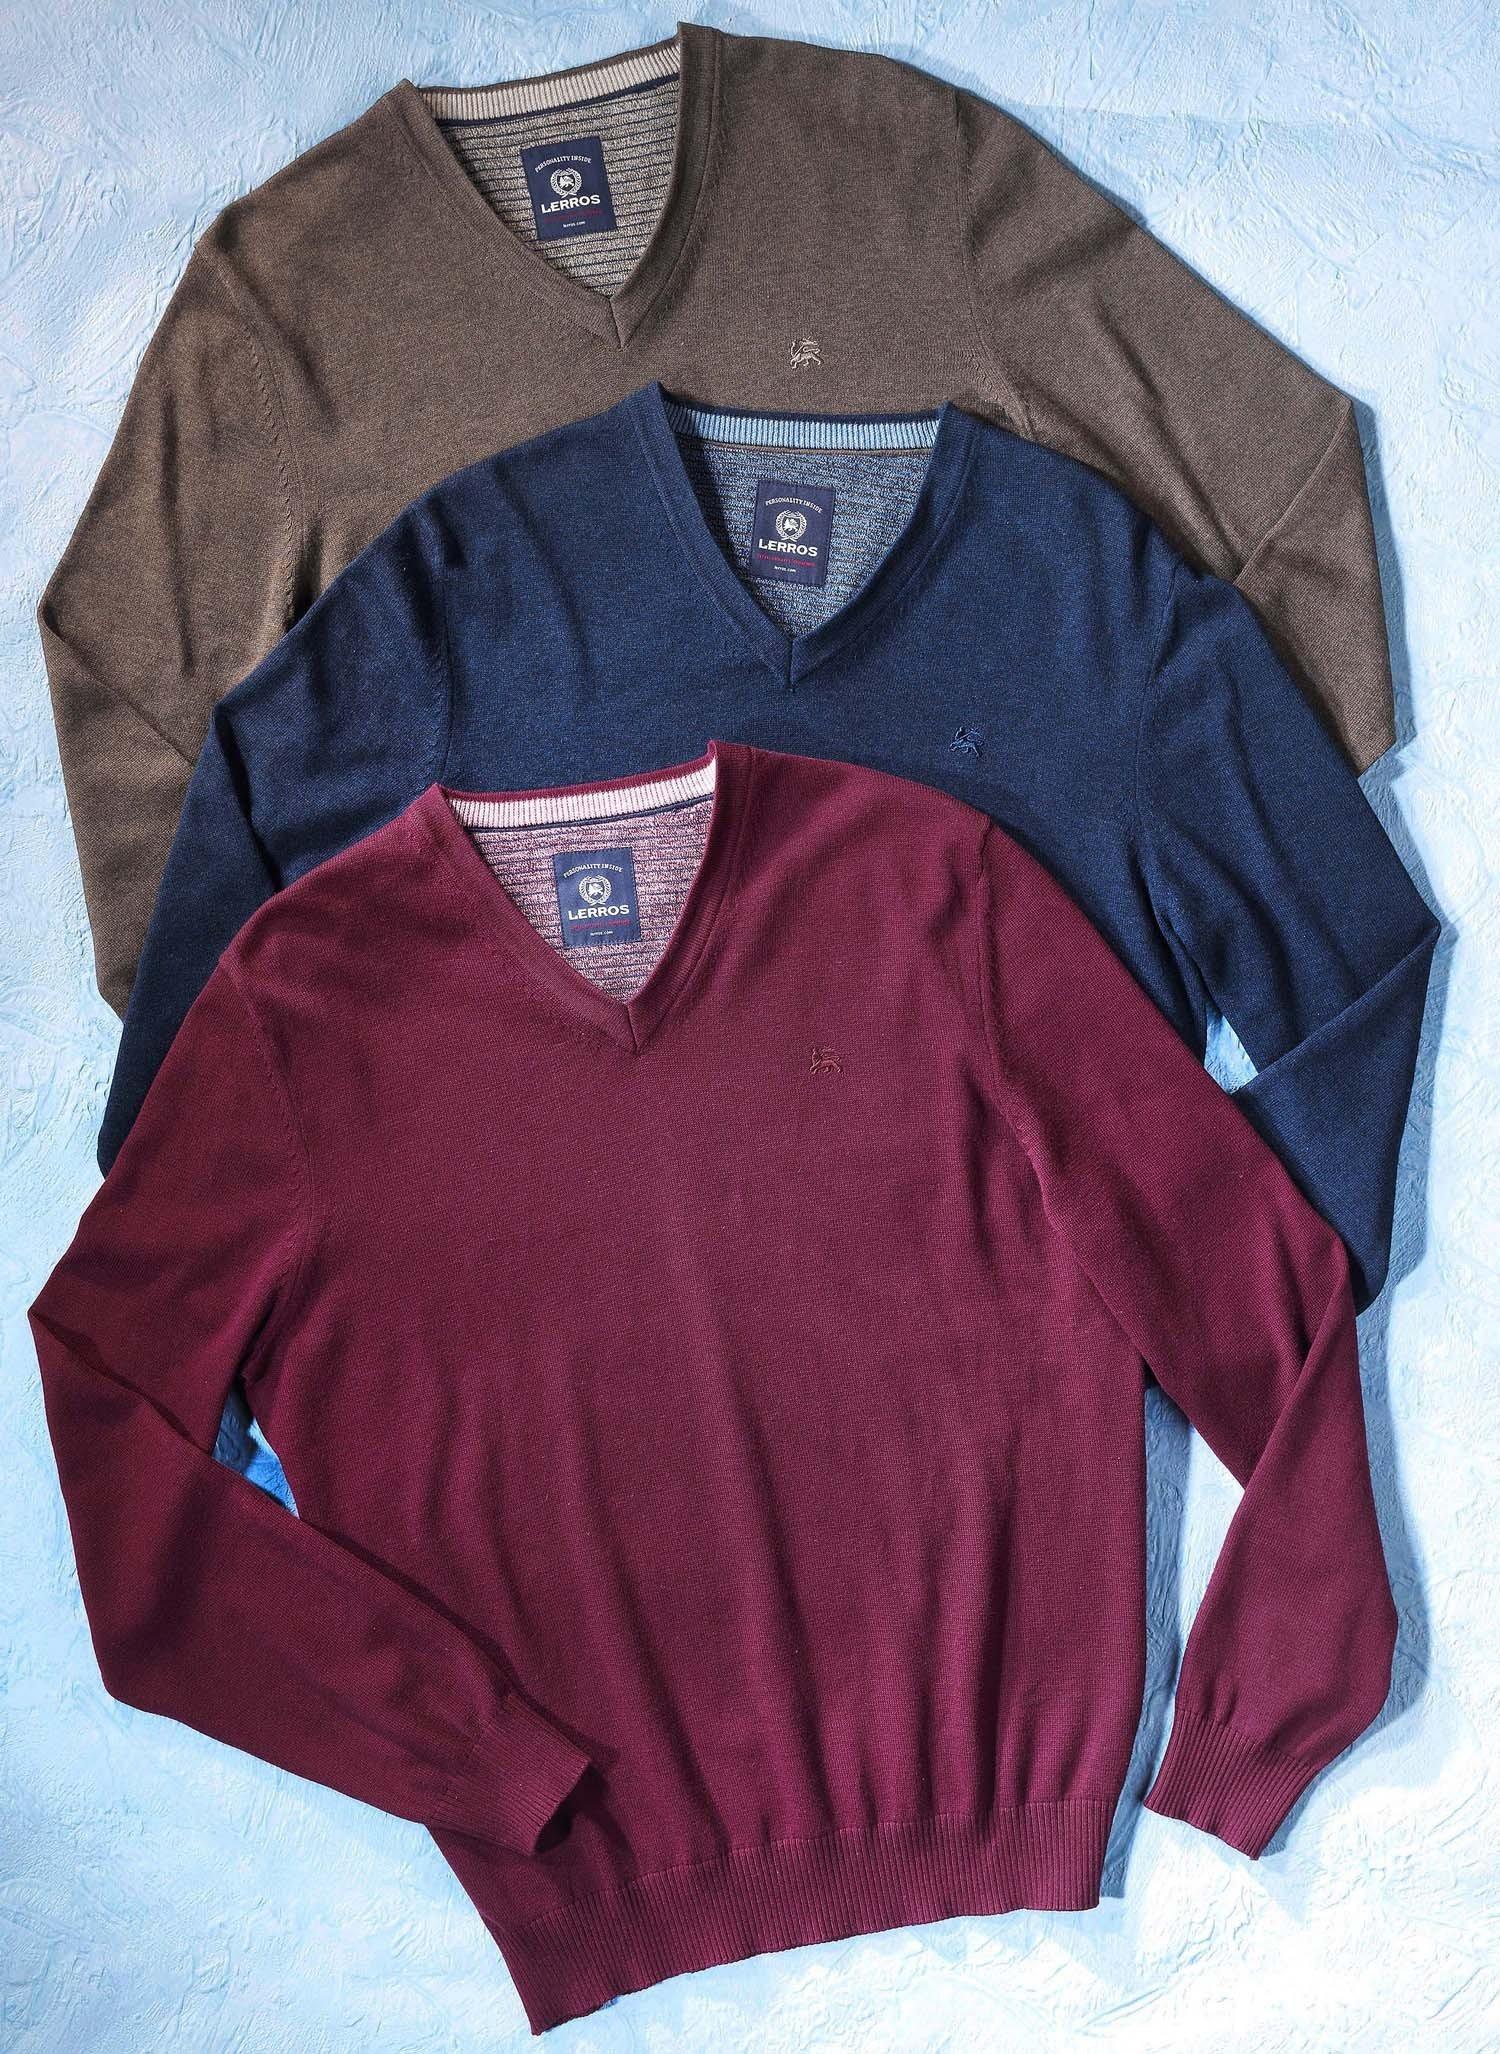 H-Pullover,V-Neck.braun L 043 - 2 - Ronja.ch